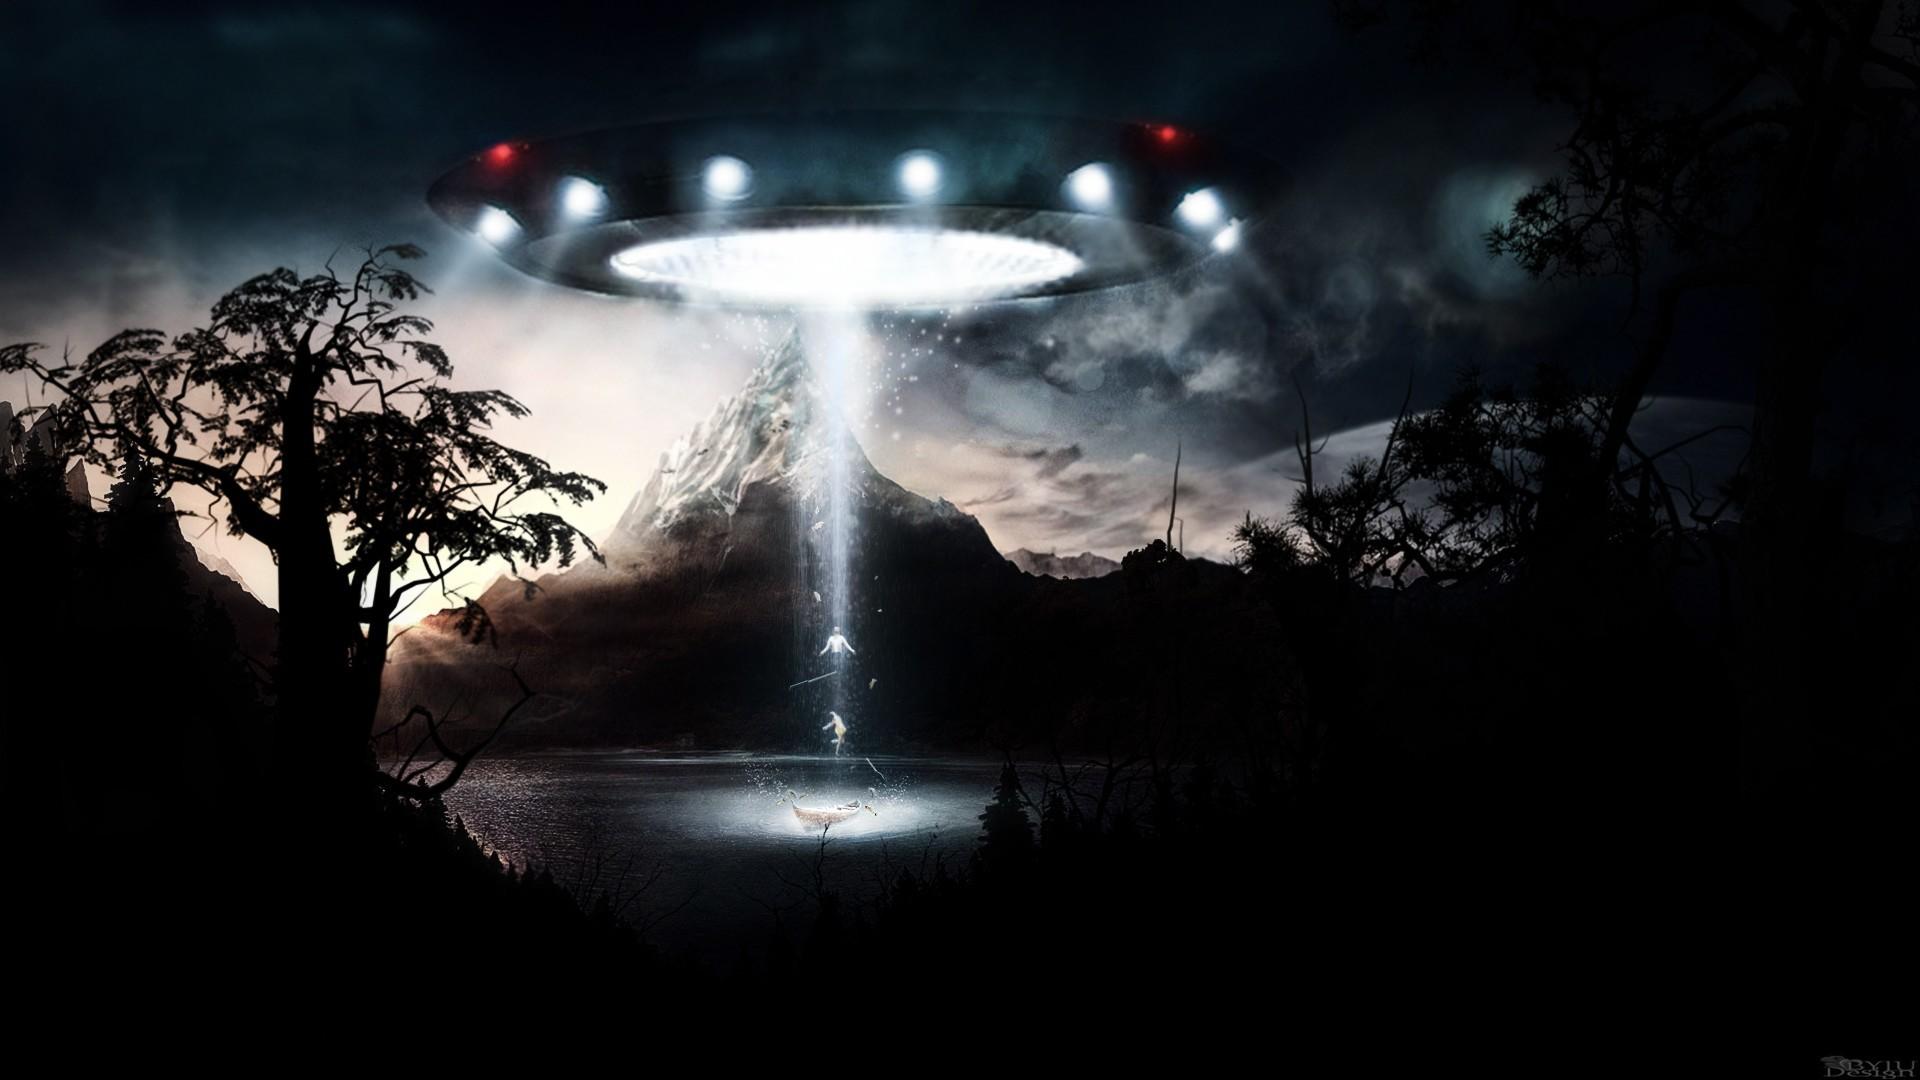 bright light UFO | Hd Ufo Art Fantasy art , ufo , bright light, trees,  mountain – hd … | ufo | Pinterest | Trees, Art and Fantasy art